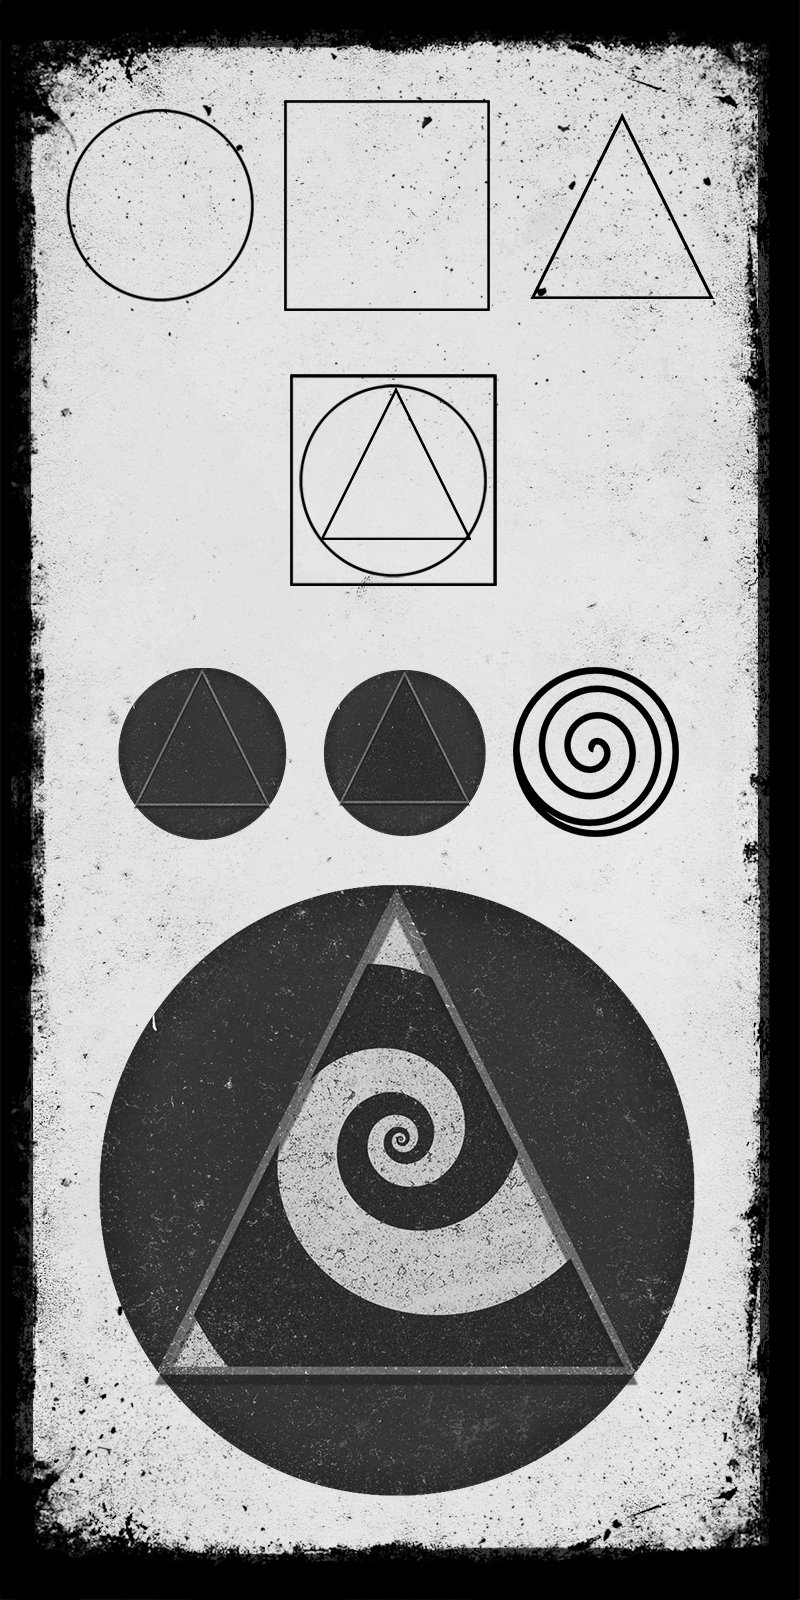 Raiyan momen geometric progression